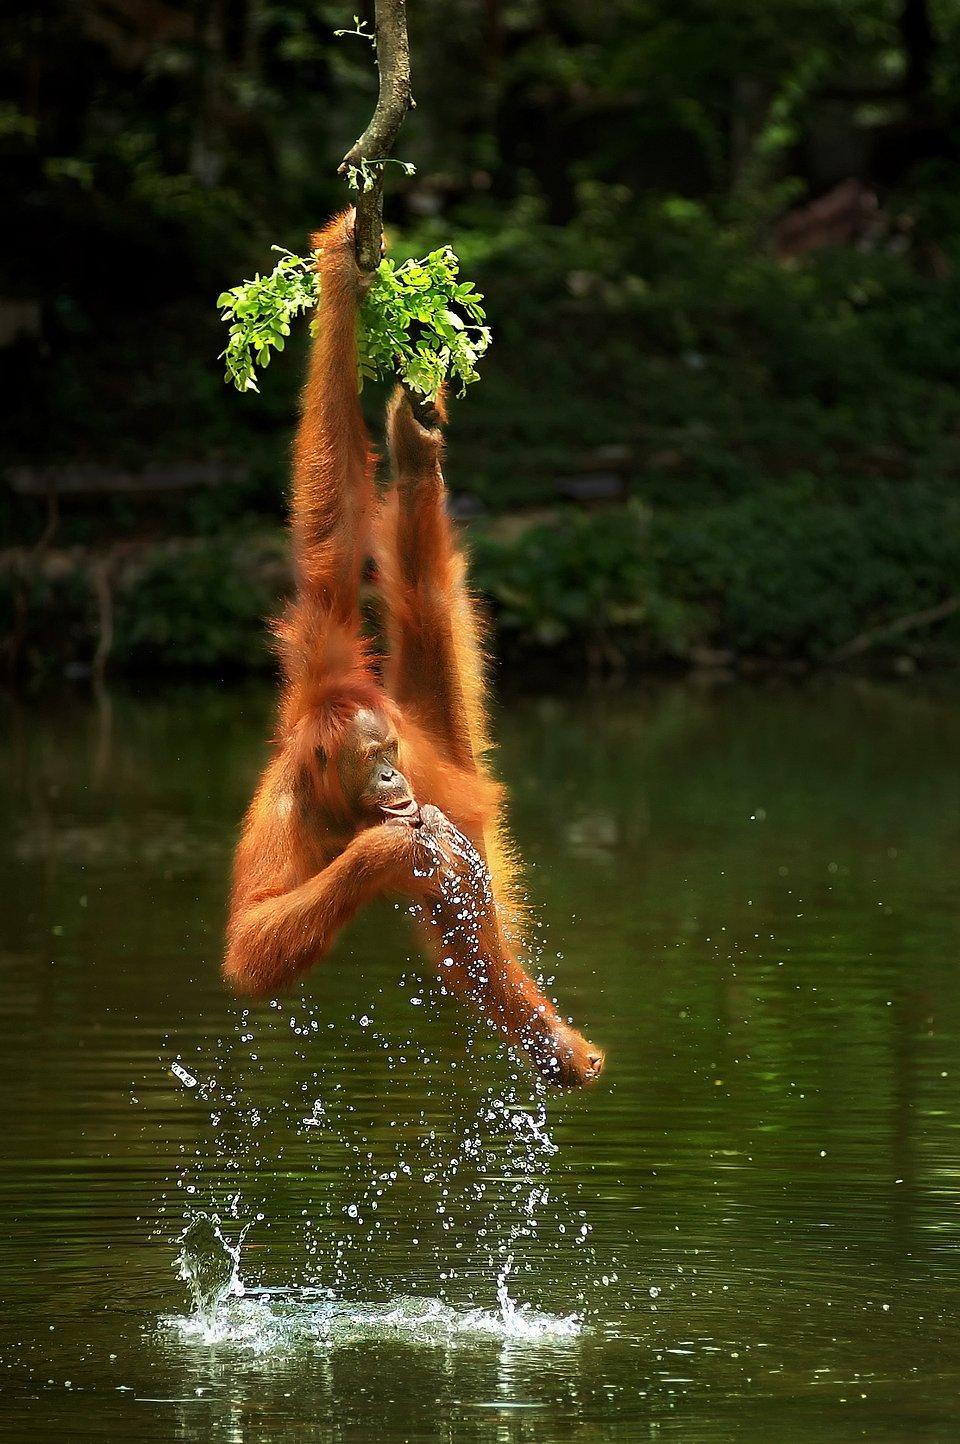 Orangutan drinking water while hanging from tree.